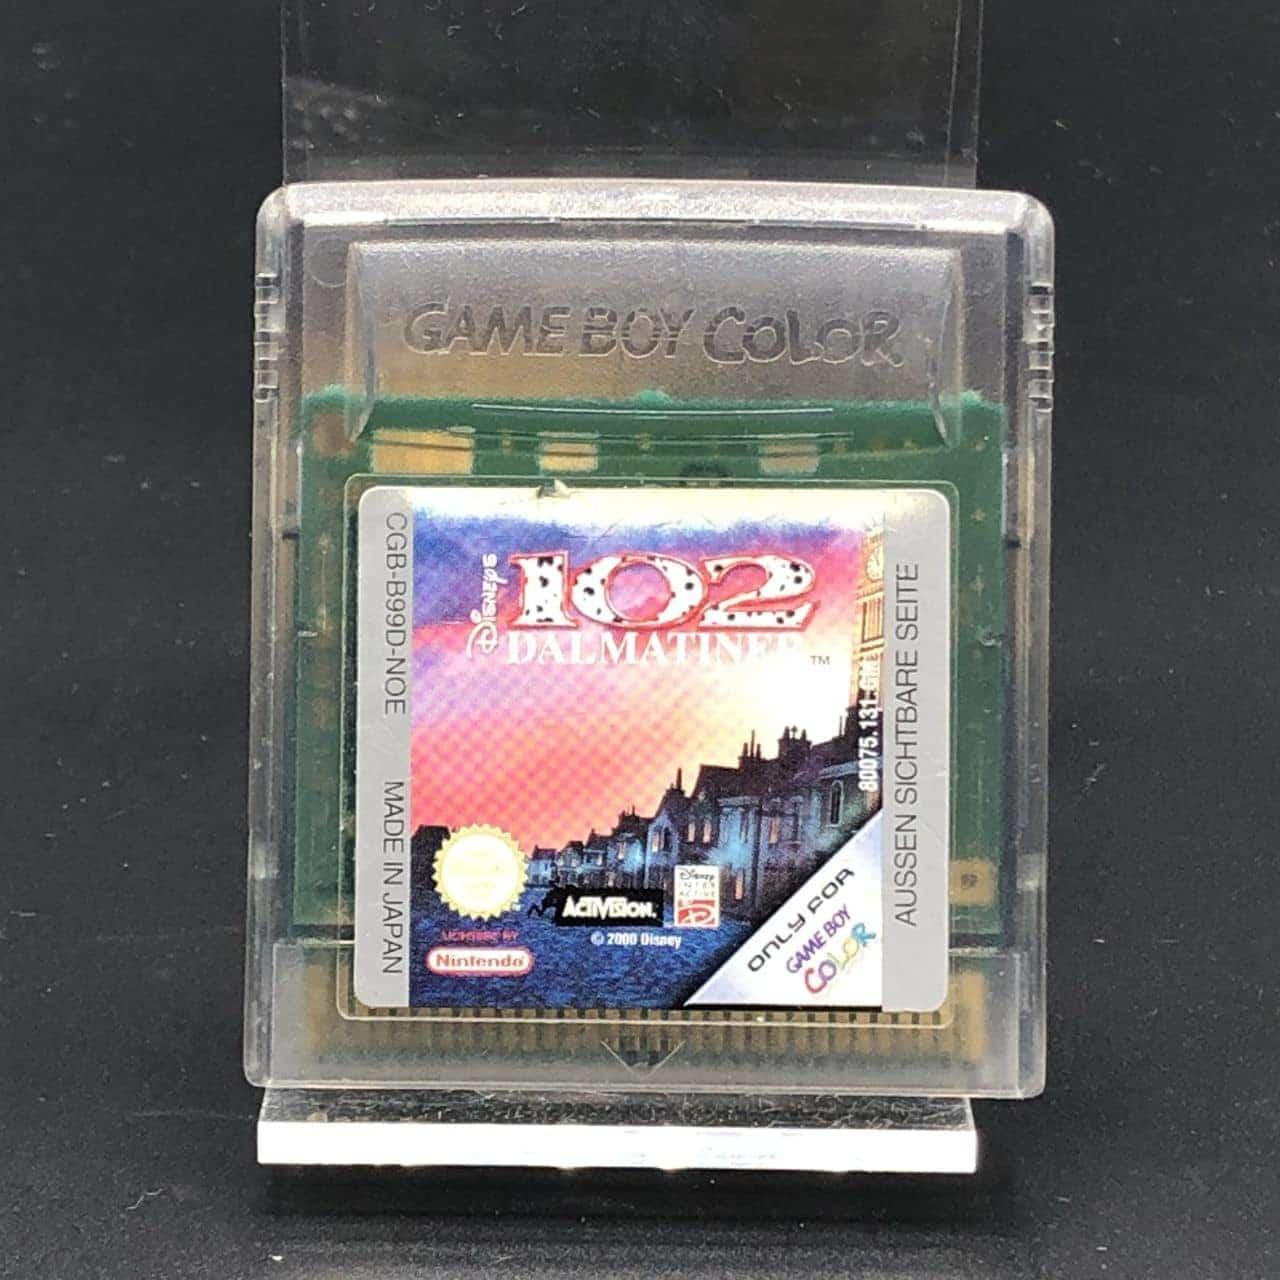 GBC 102 Dalmatiner (Modul) (Gut) Nintendo Game Boy Color